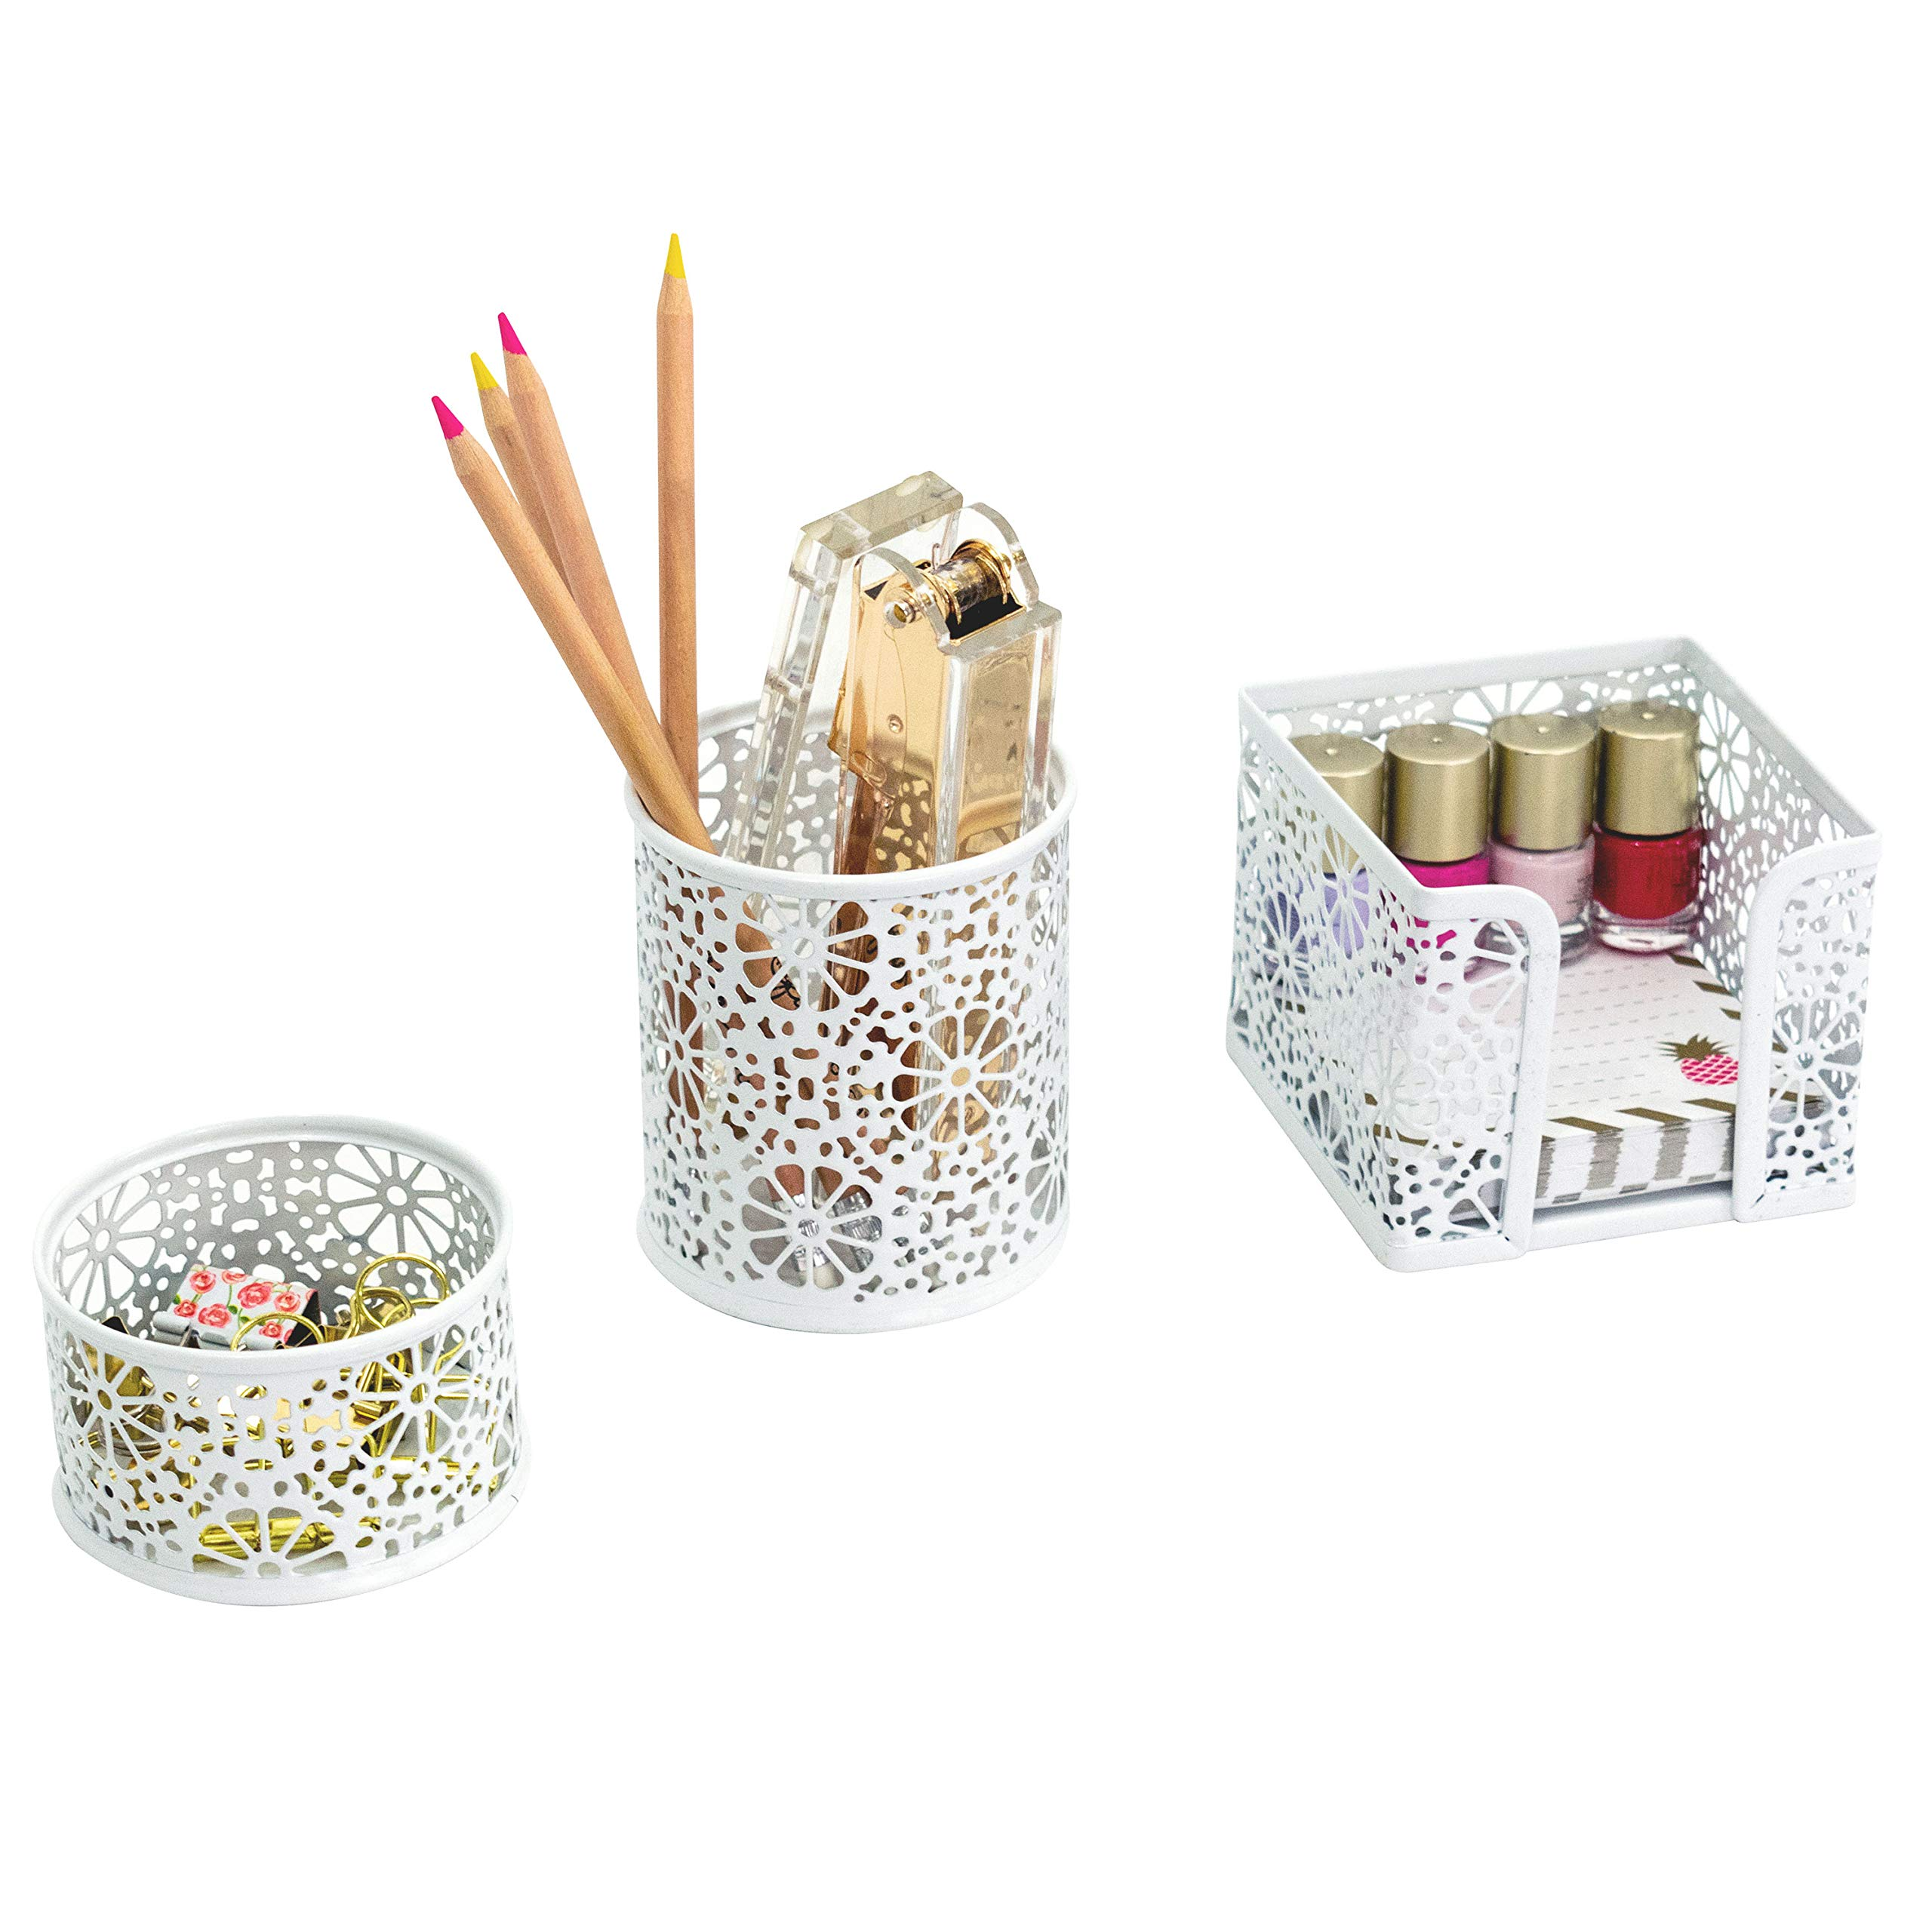 Blu Monaco White Desk Organizer for Women - 3 Piece Desk Accessories Set - Paper Clip-Accessory Tray, Sticky Note Holder, Pen Cup - White Floral Sunflower Pattern